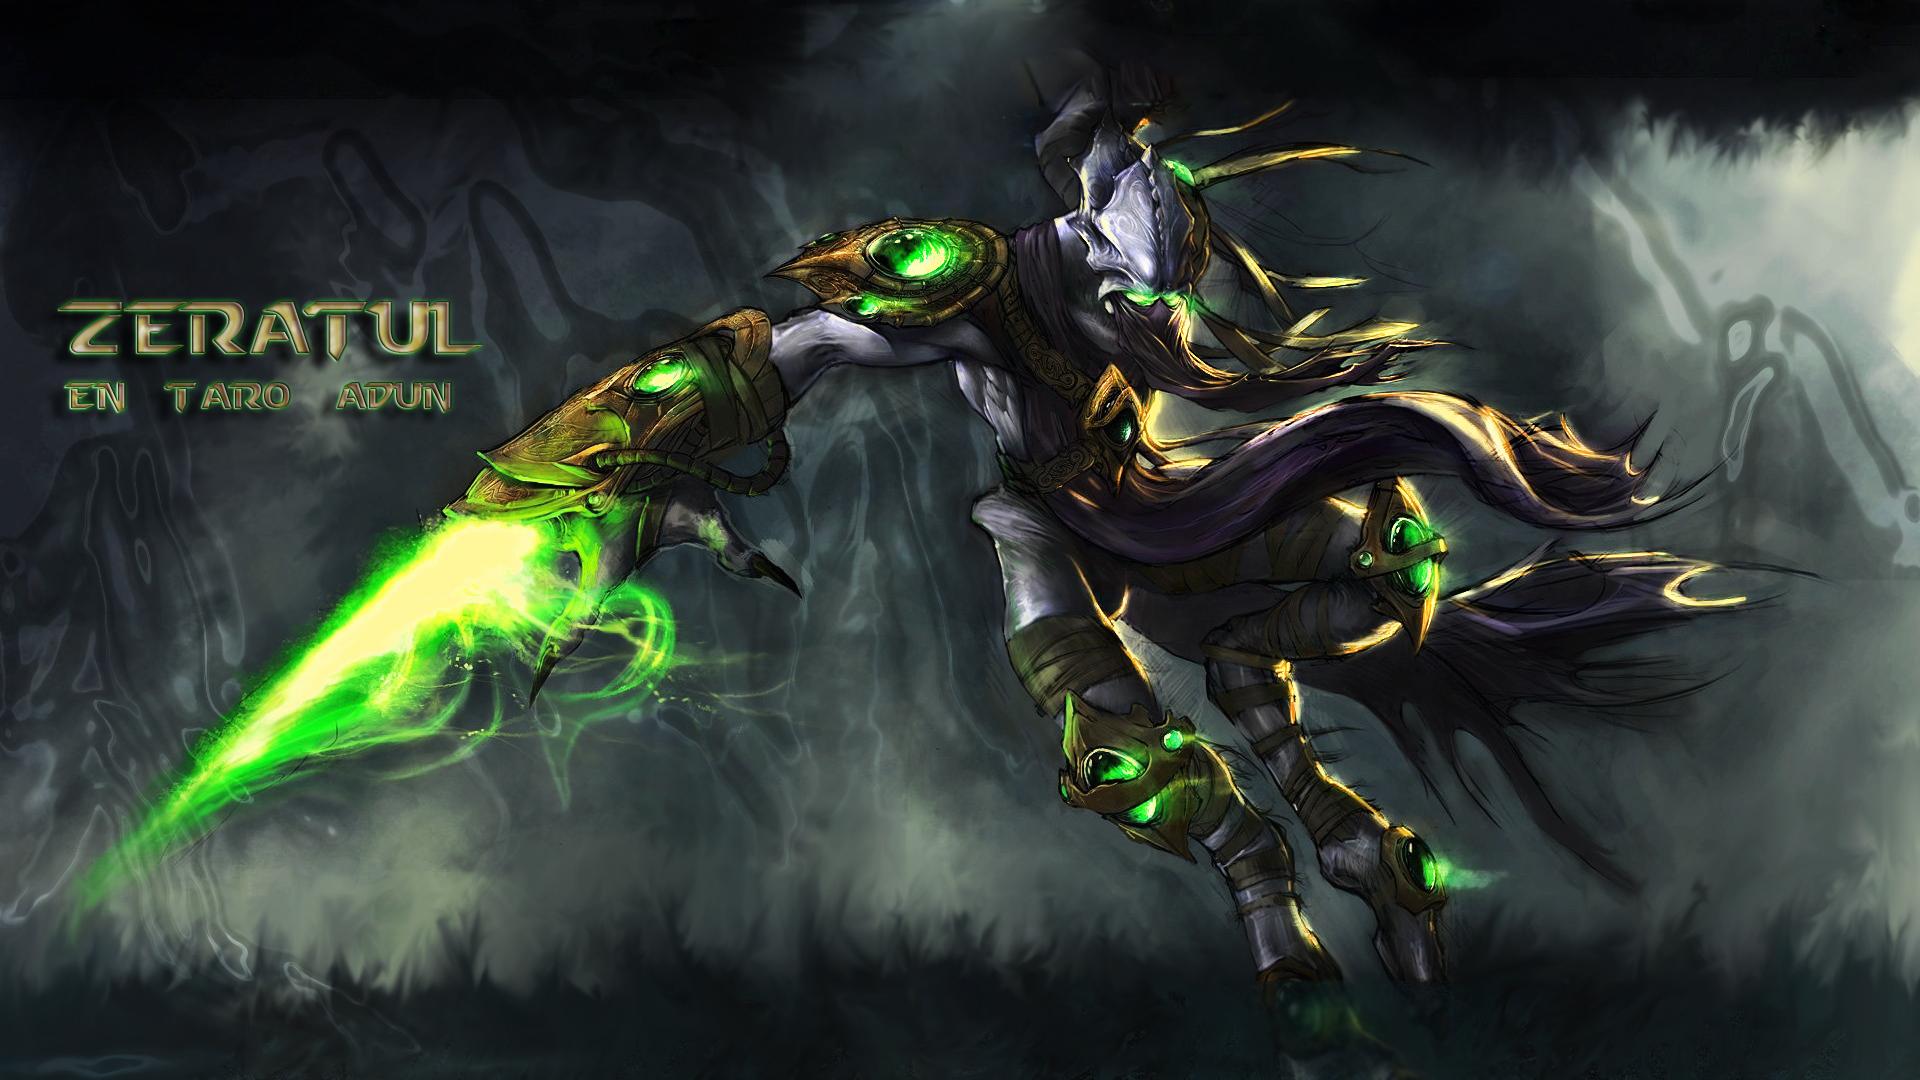 Wallpaper Starcraft Warcraft Zeratul Heroes Of The Storm 1920x1080